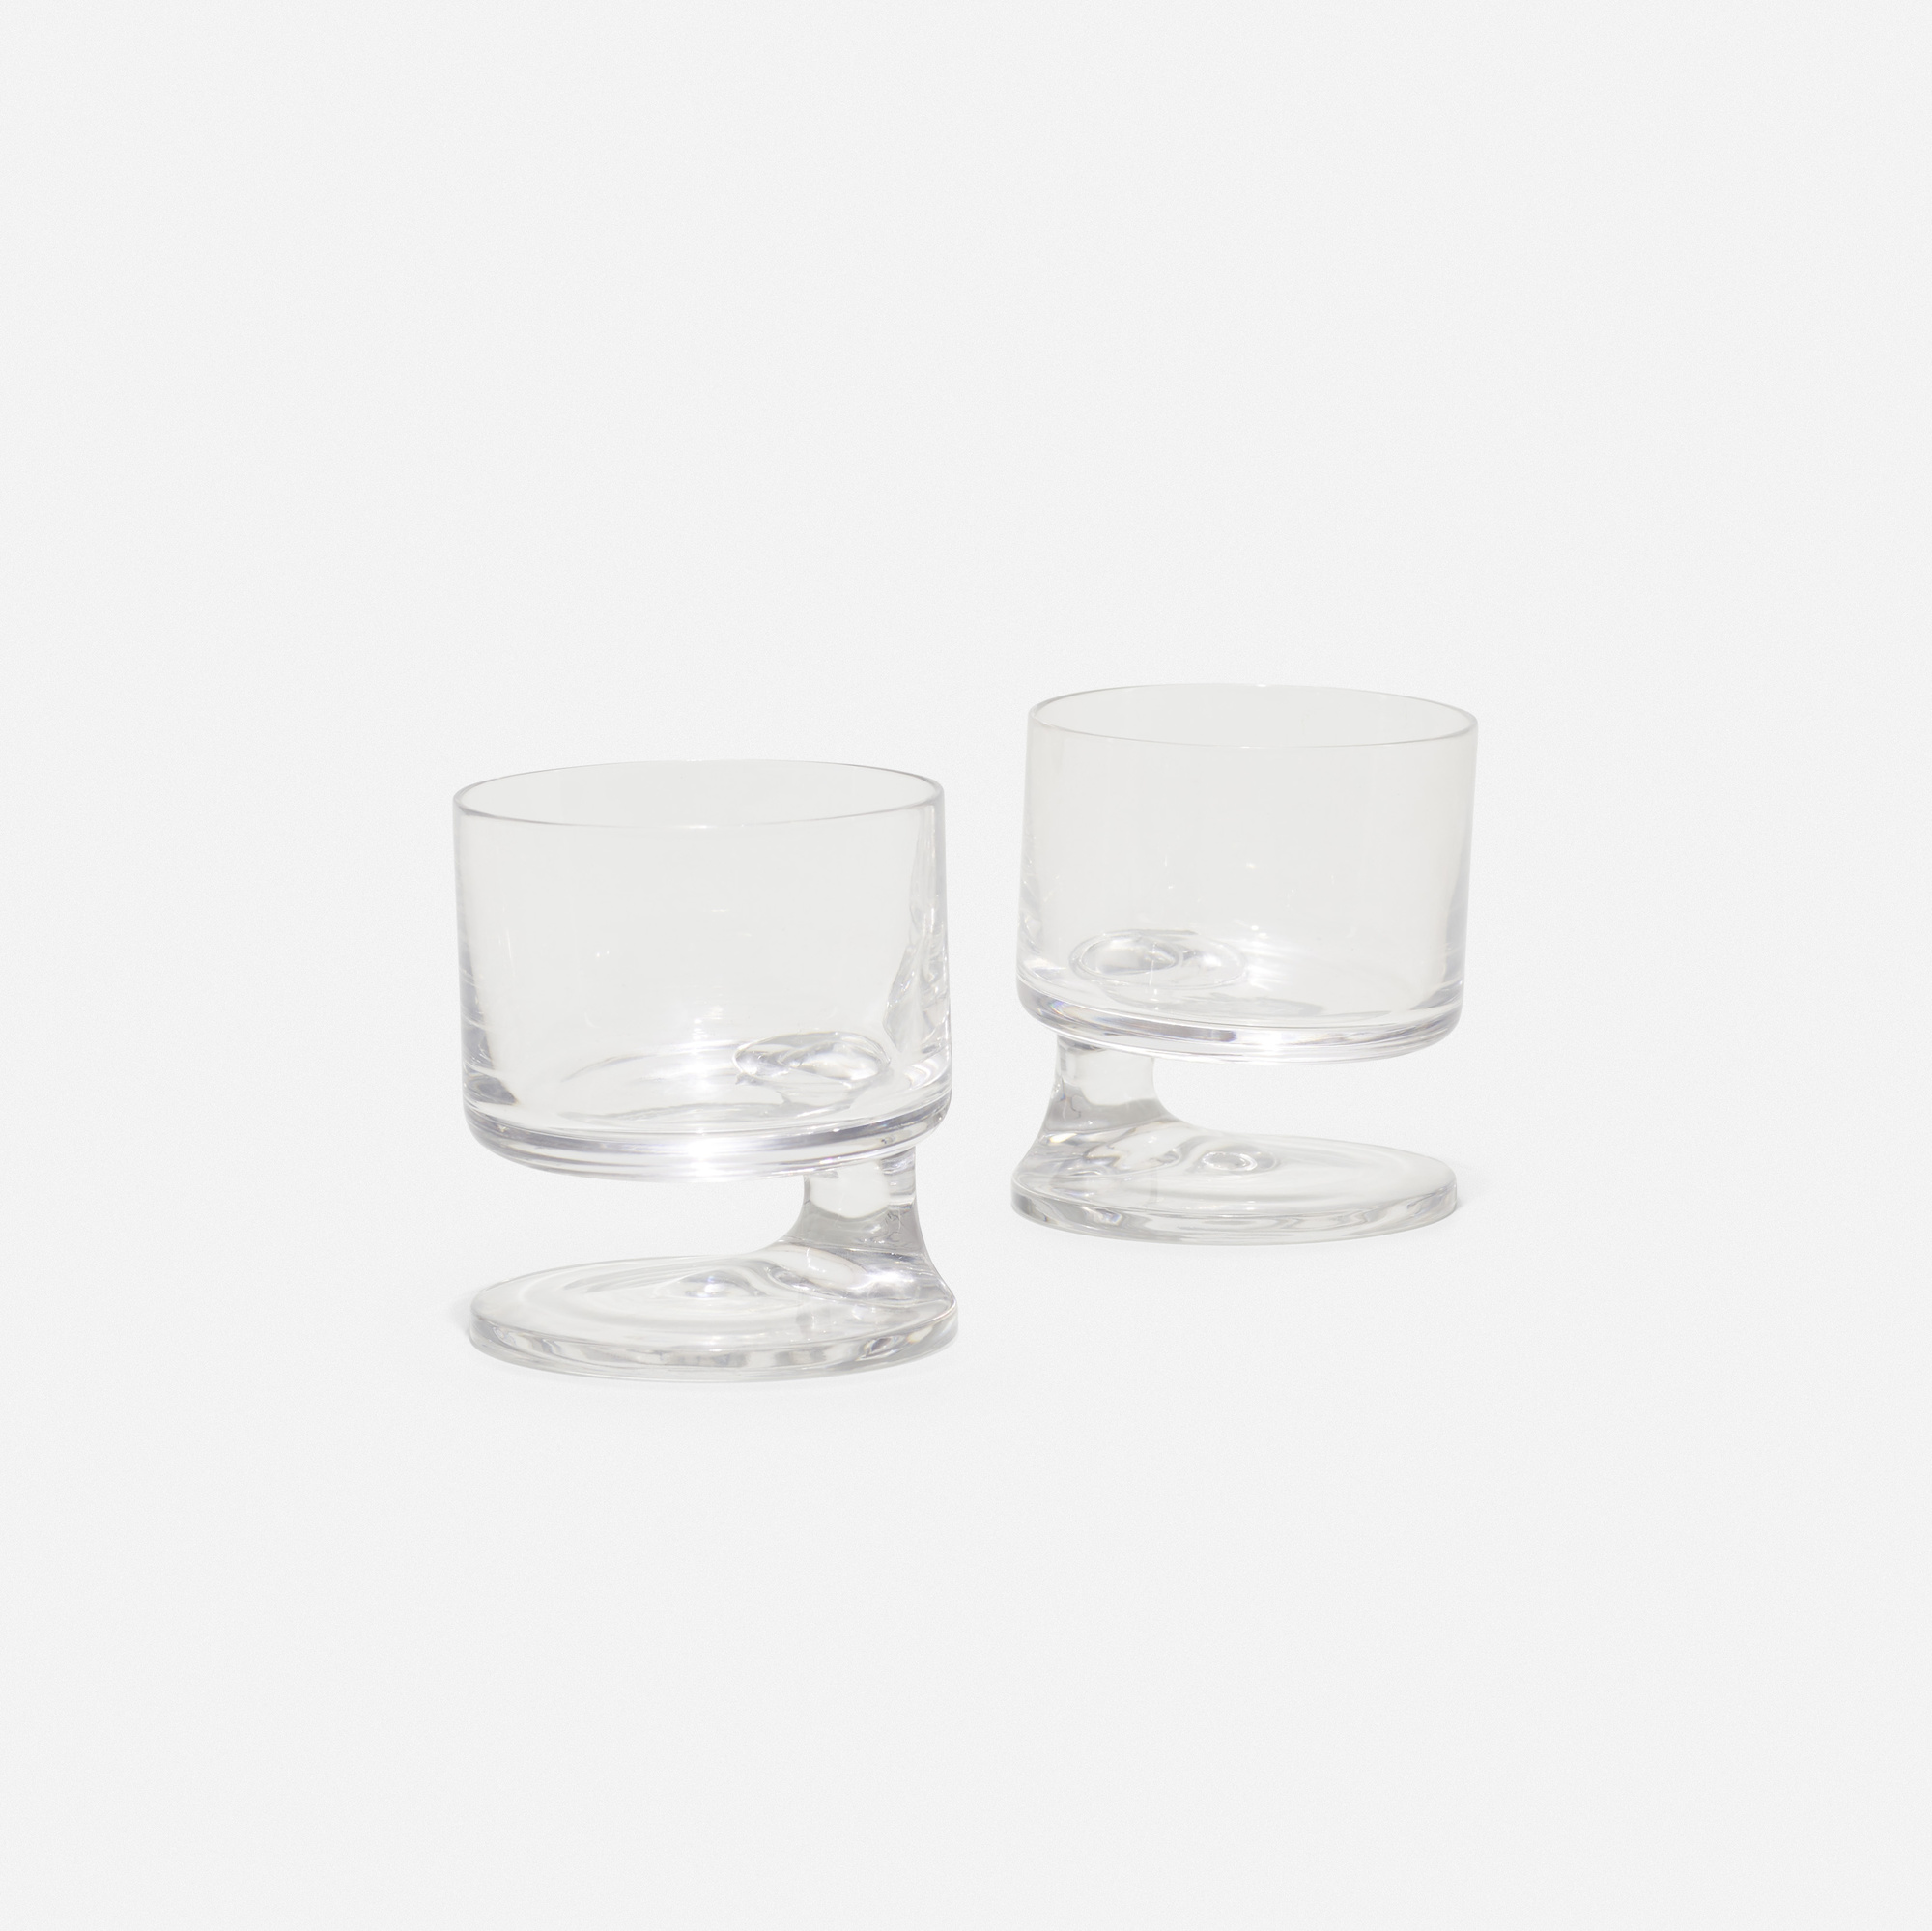 453: Joe Colombo / Smoke glasses, pair (1 of 1)